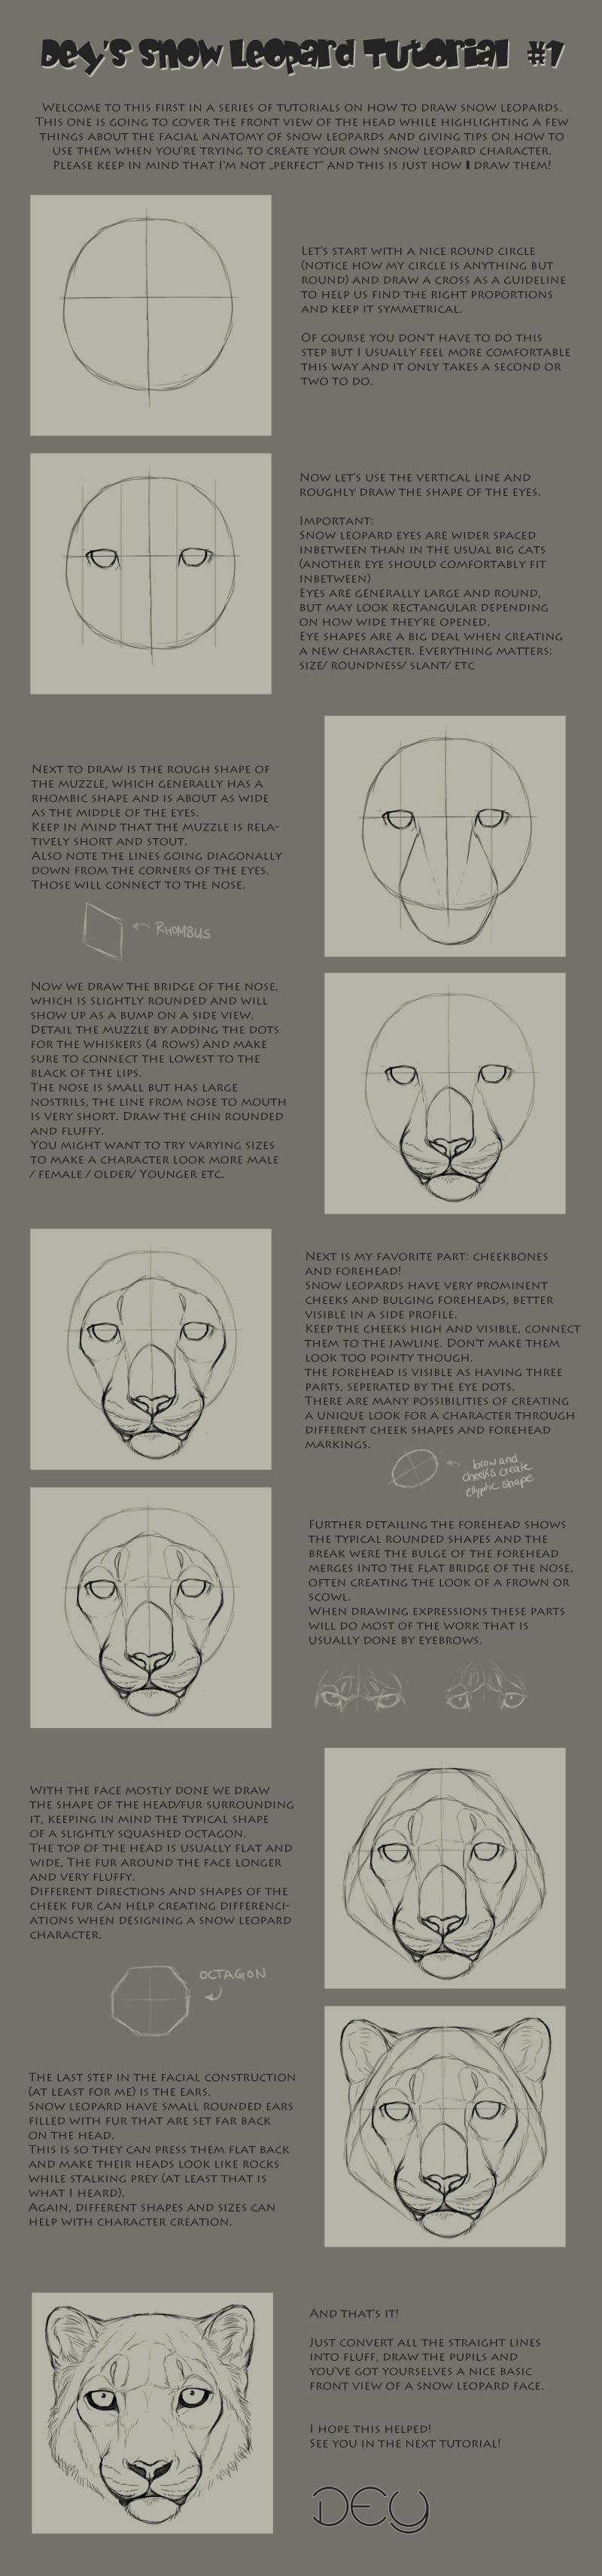 Drawn snow leopard deviantart Leopard DeyVarah by Head #1